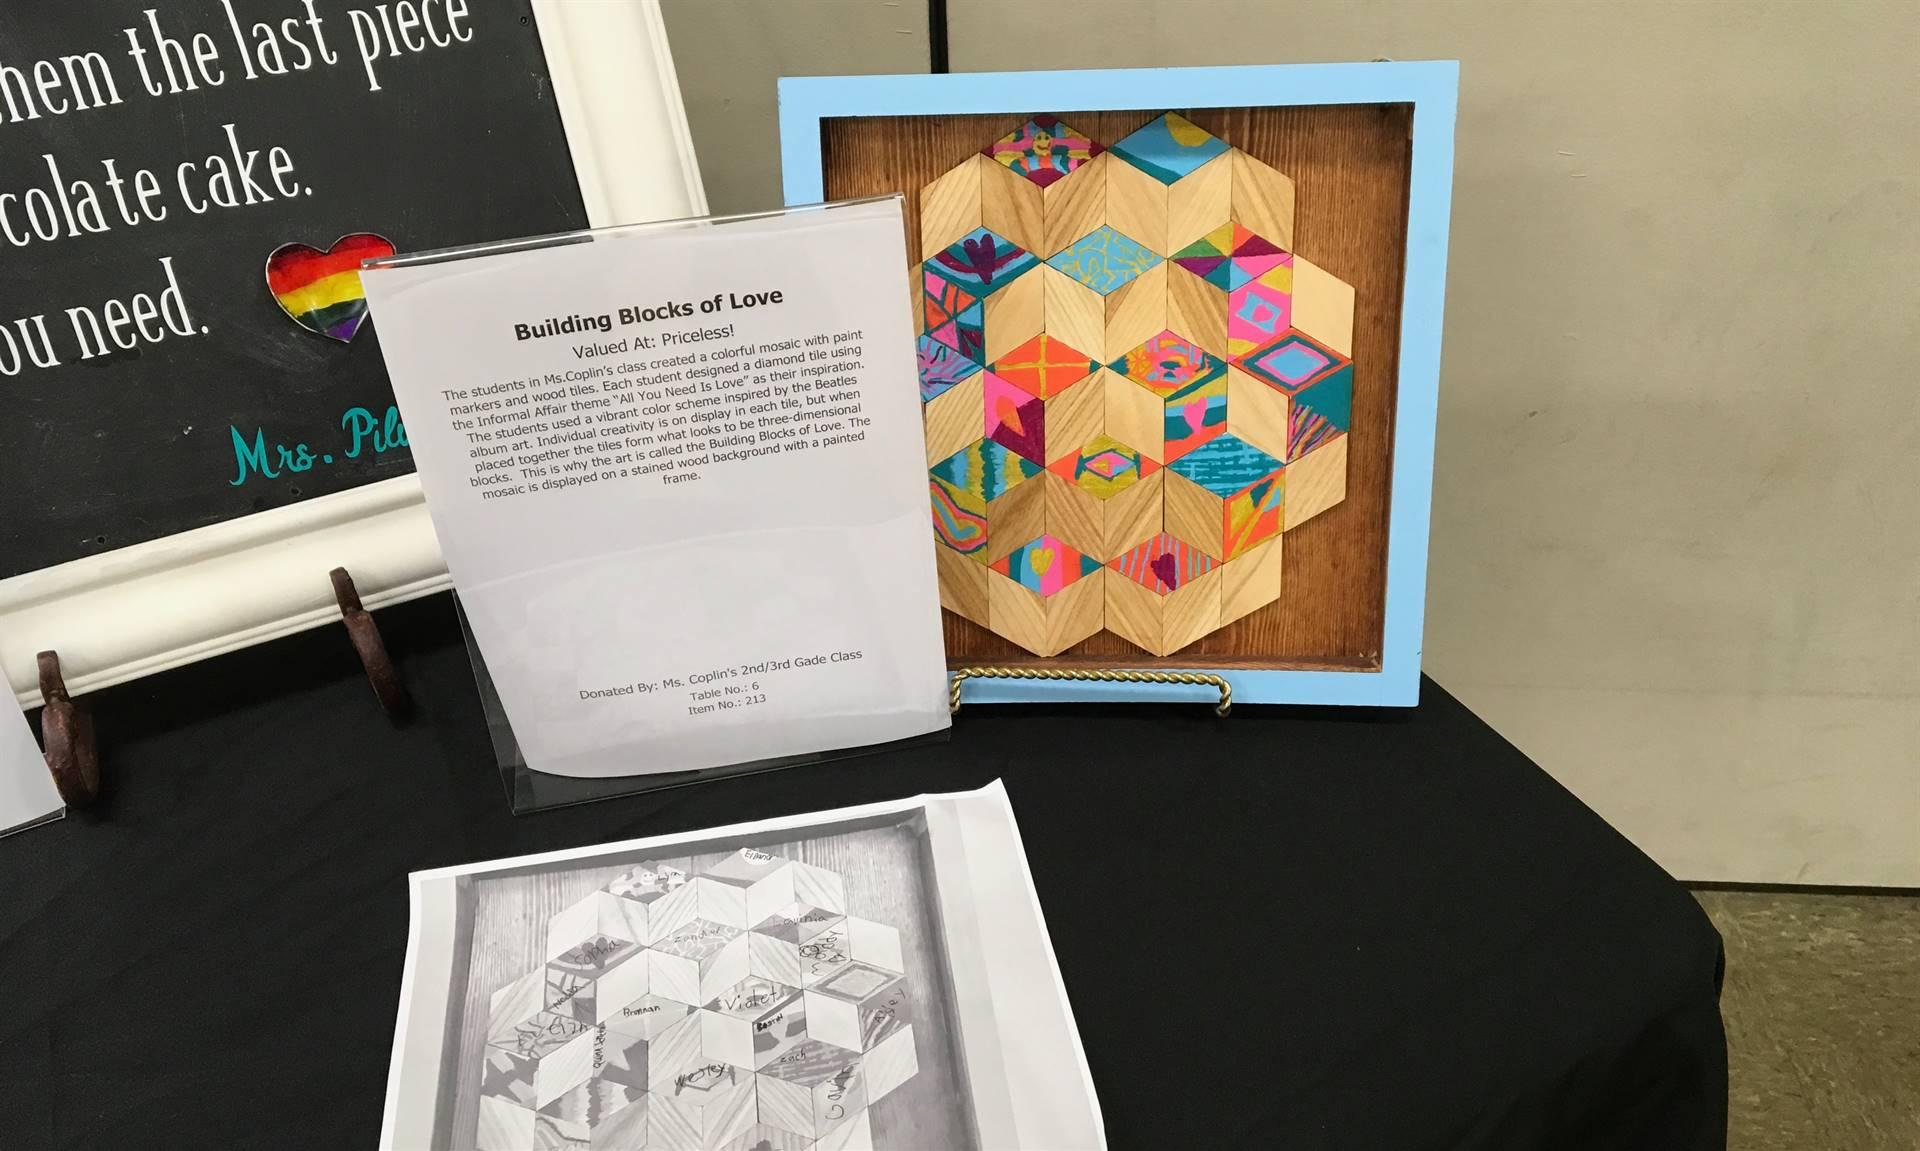 Informal Affair Art Project: Building Blocks of Love